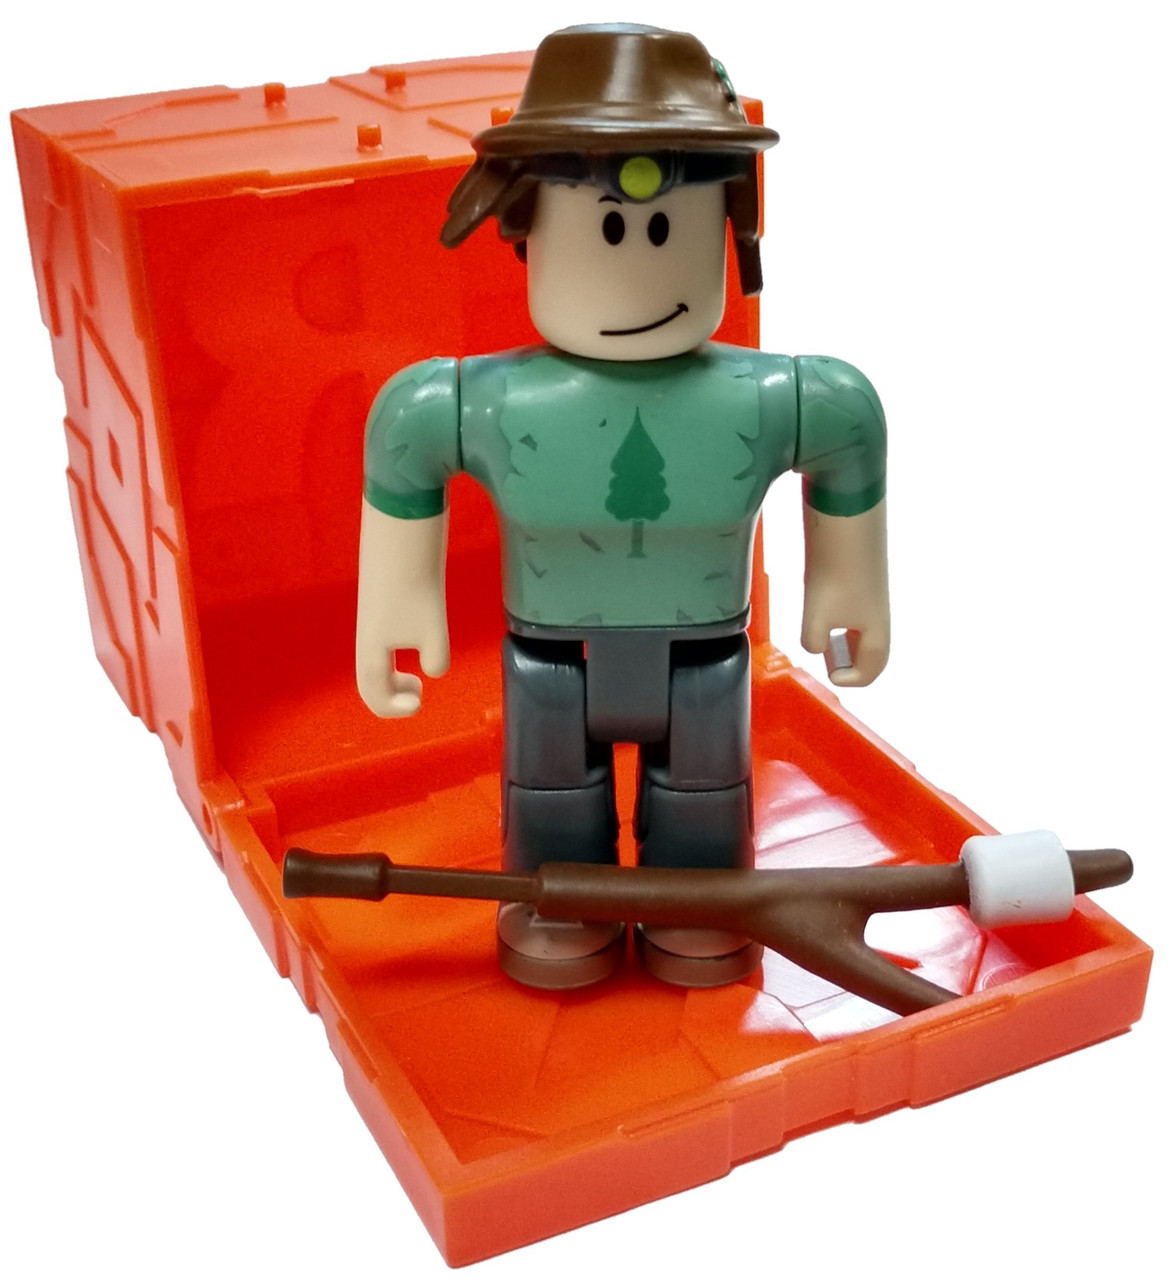 Roblox Series 6 Backpacking Camper Boy 3 Mini Figure With Orange